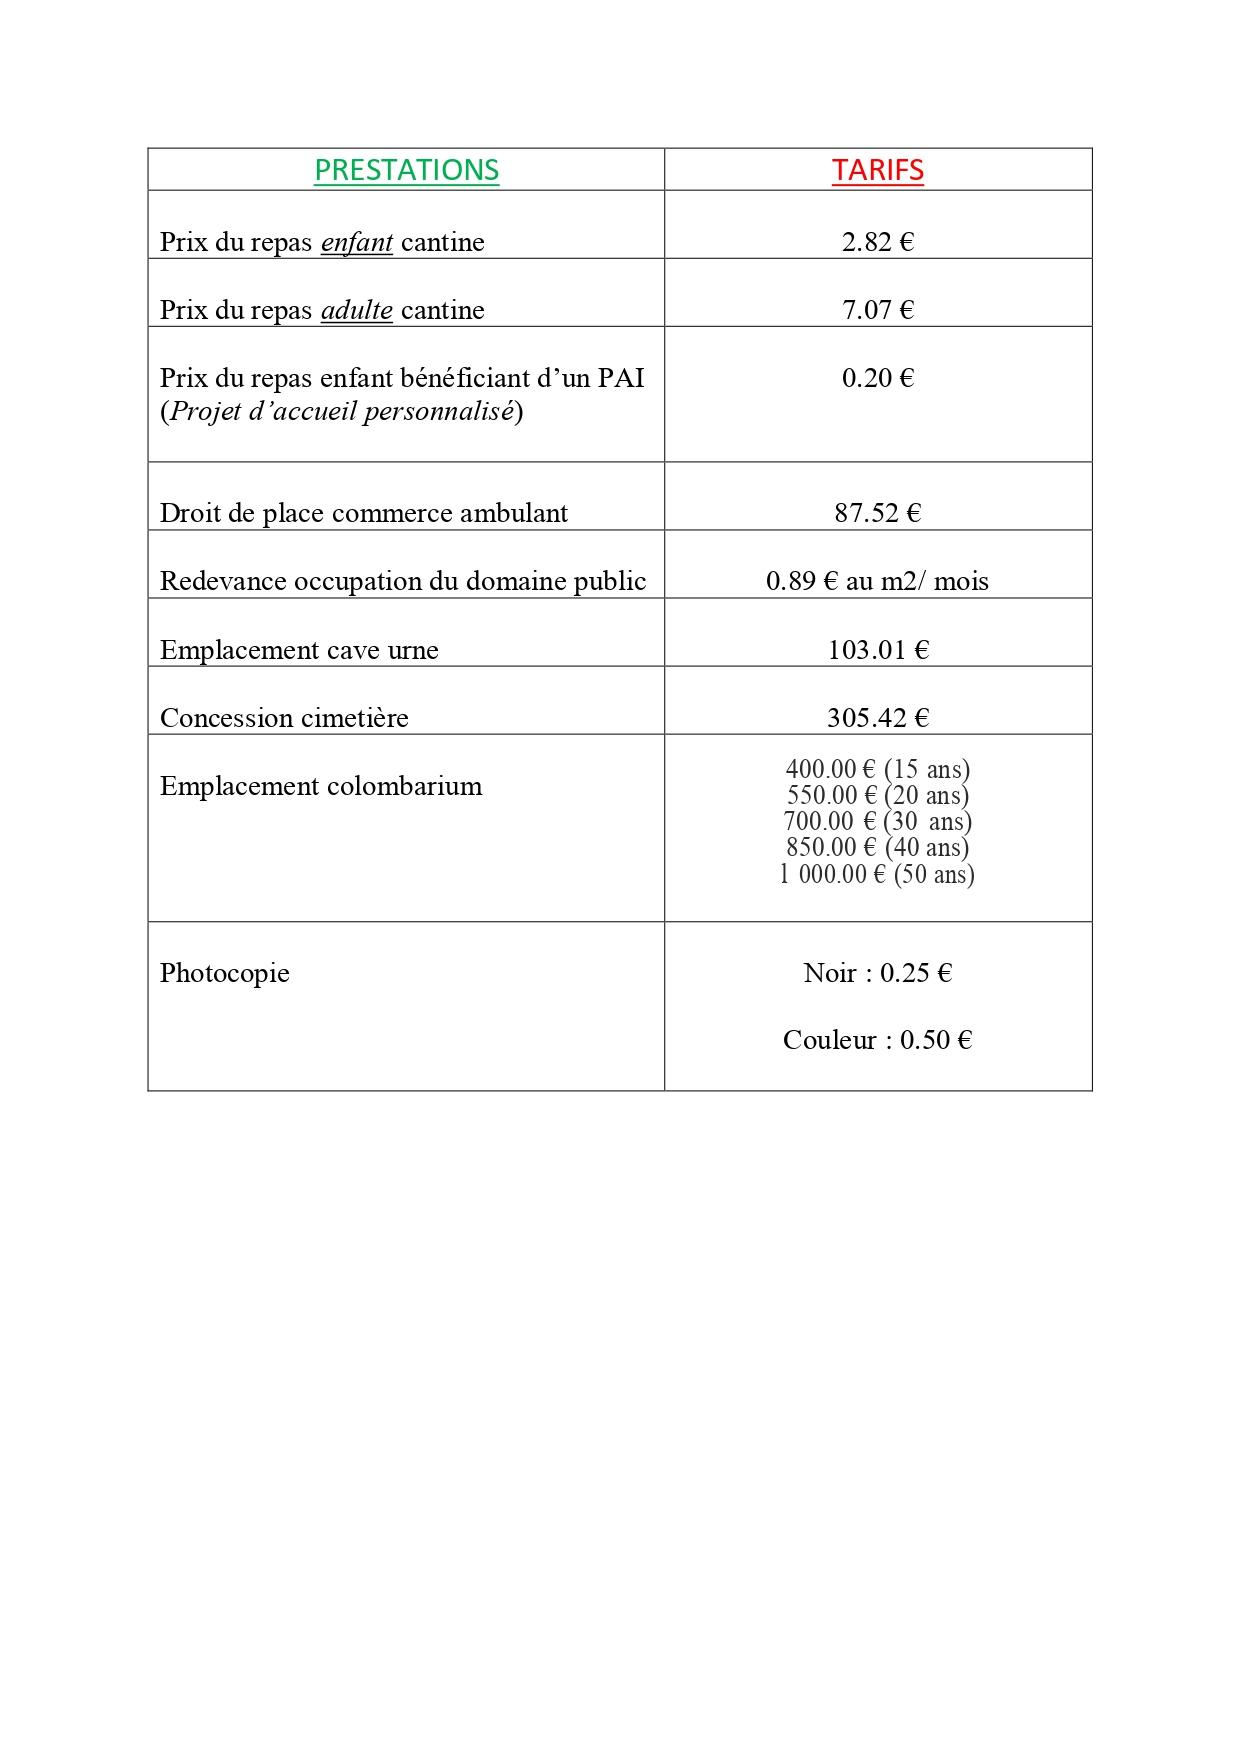 PRESTATIONS_page-0001.jpg